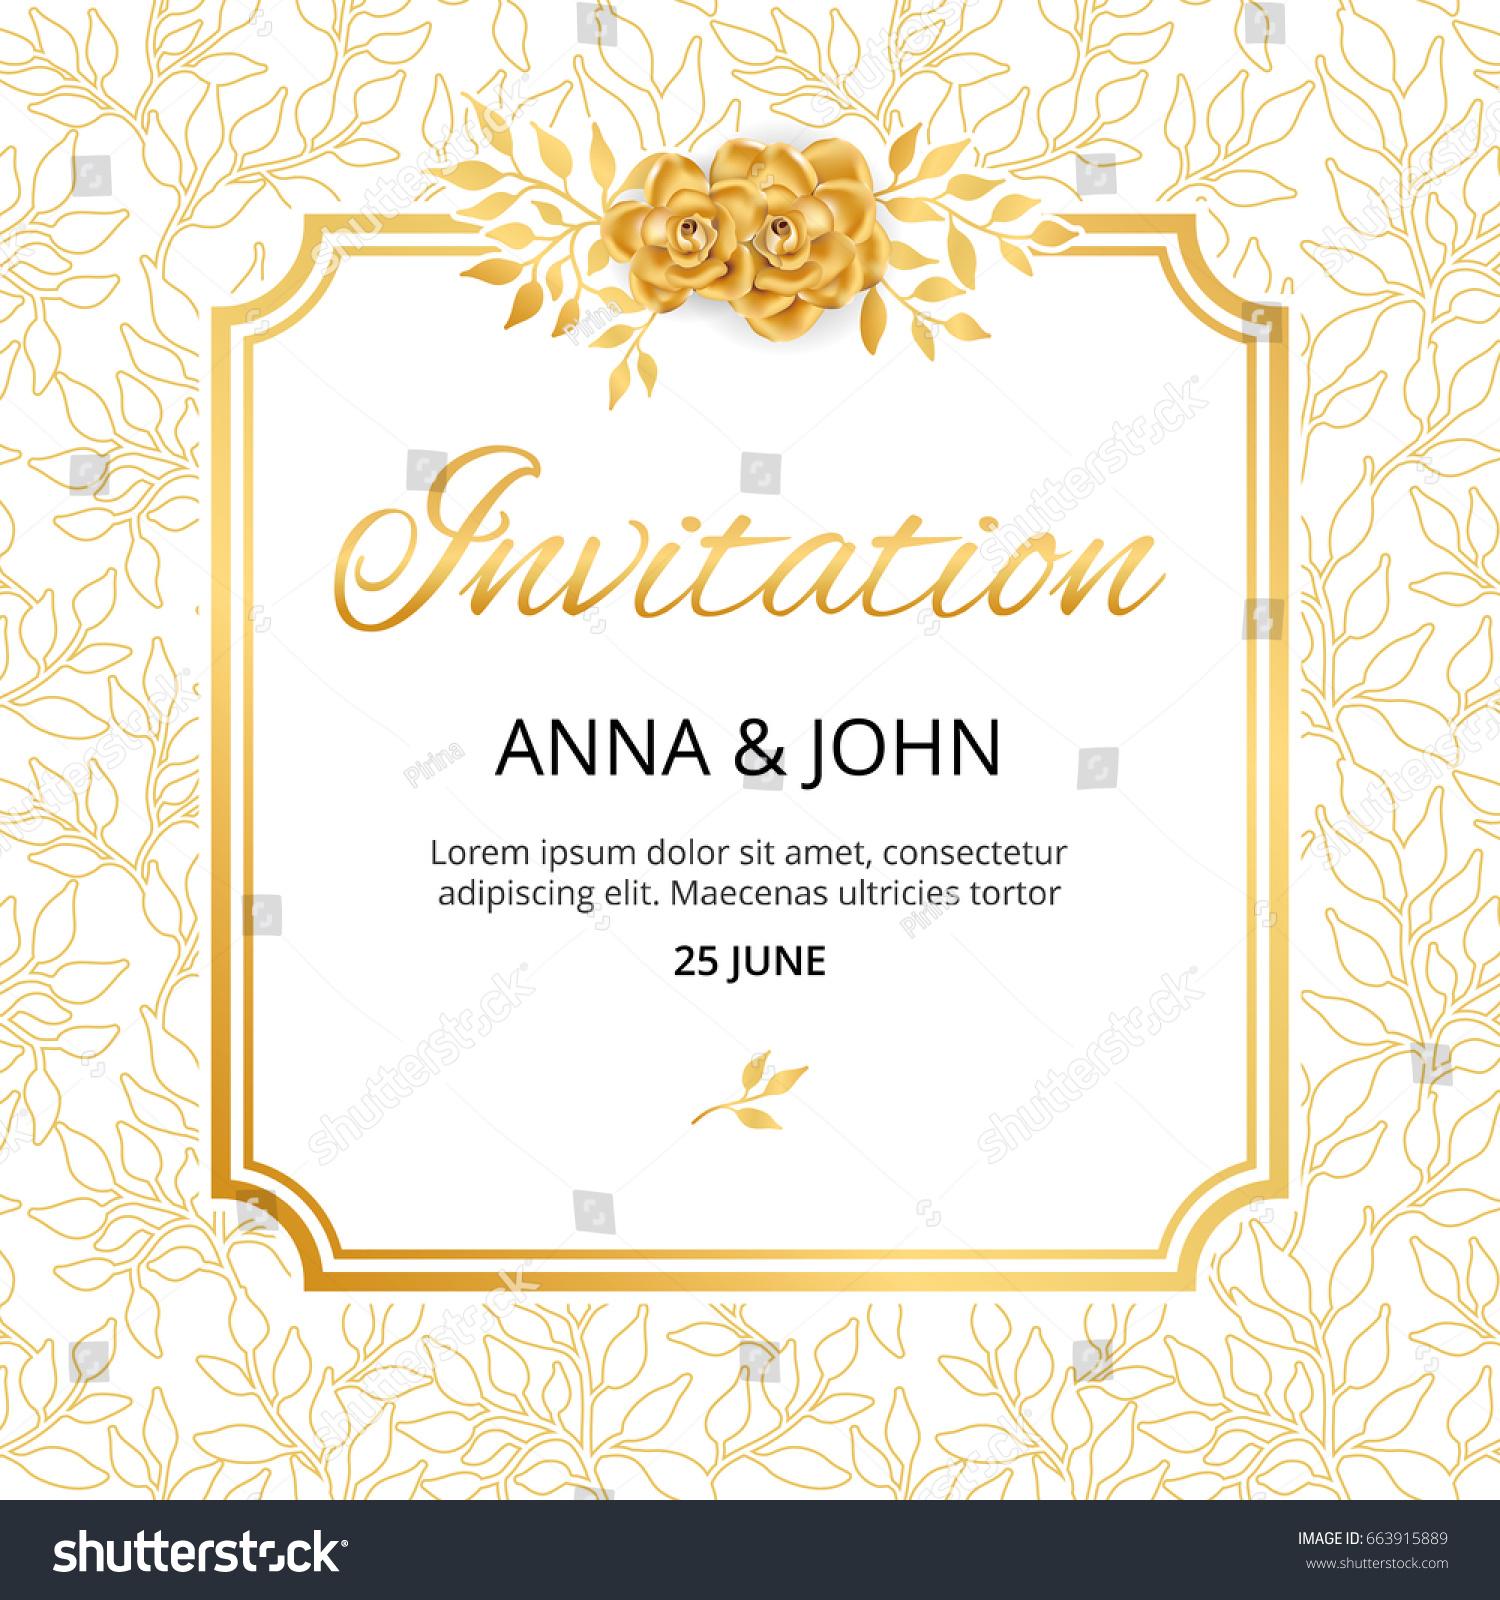 Gold Flower Wedding Paper Invitation Weddings Stock Vector 663915889 ...